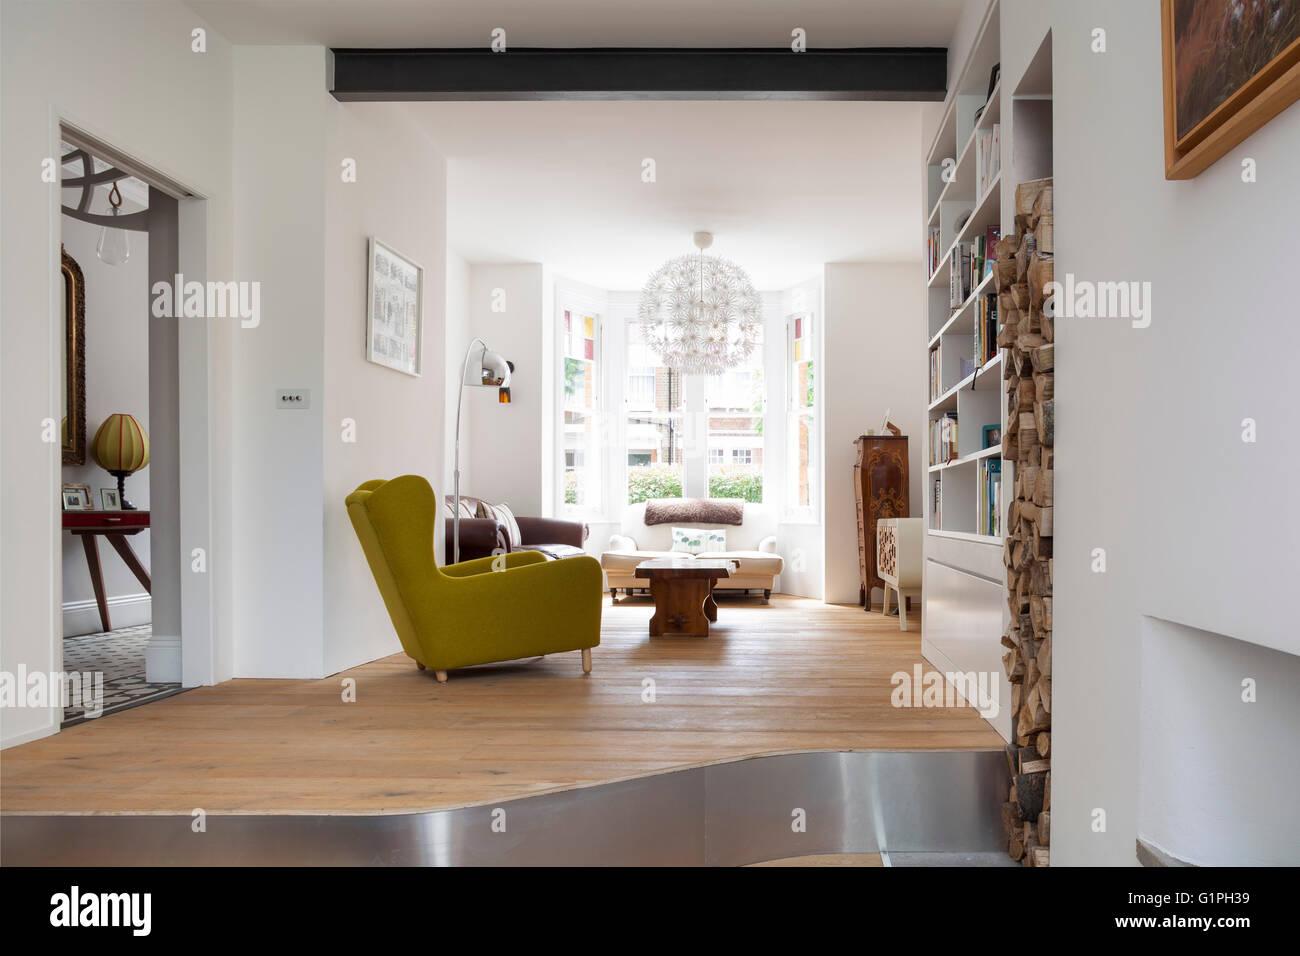 Oblique wide shot of living room. Private House, London, United Kingdom. Architect: Scenario Architecture, 2016. - Stock Image